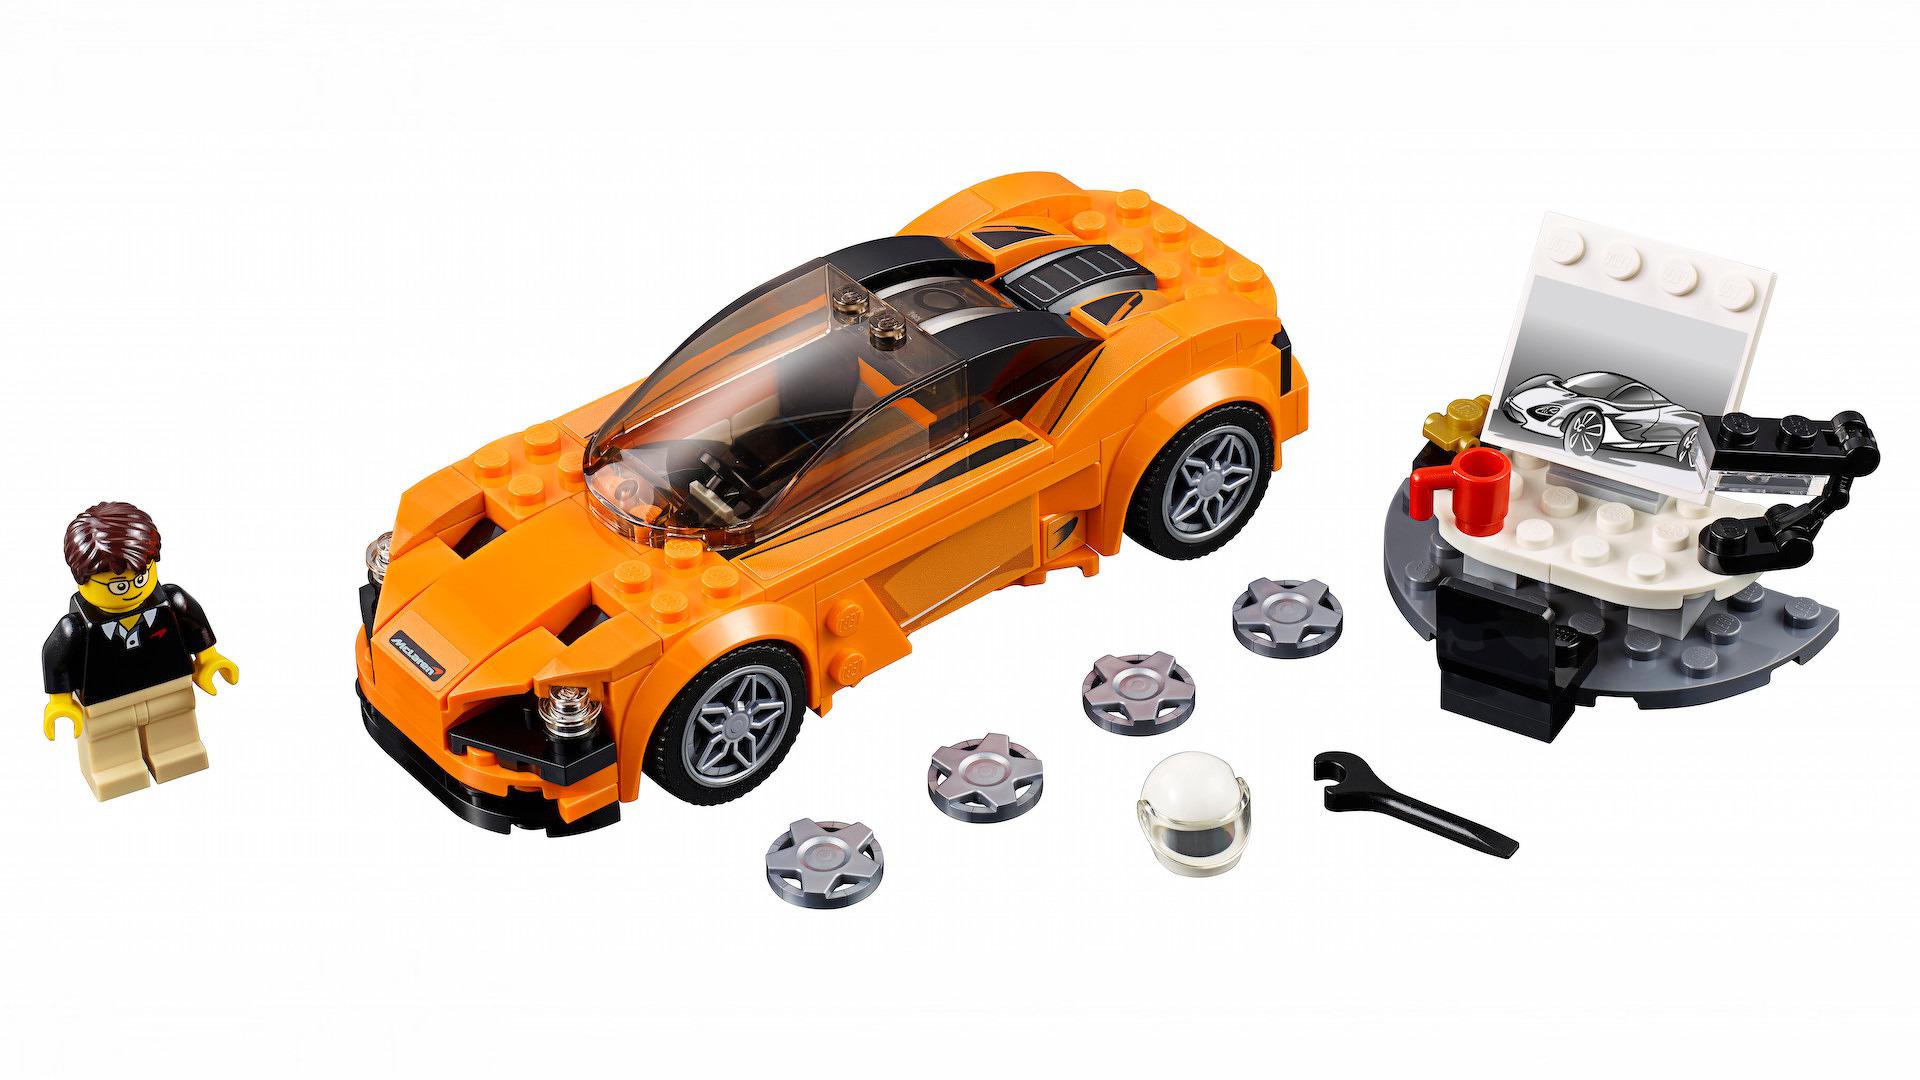 mclaren-720s-lego-speed-champions (1)